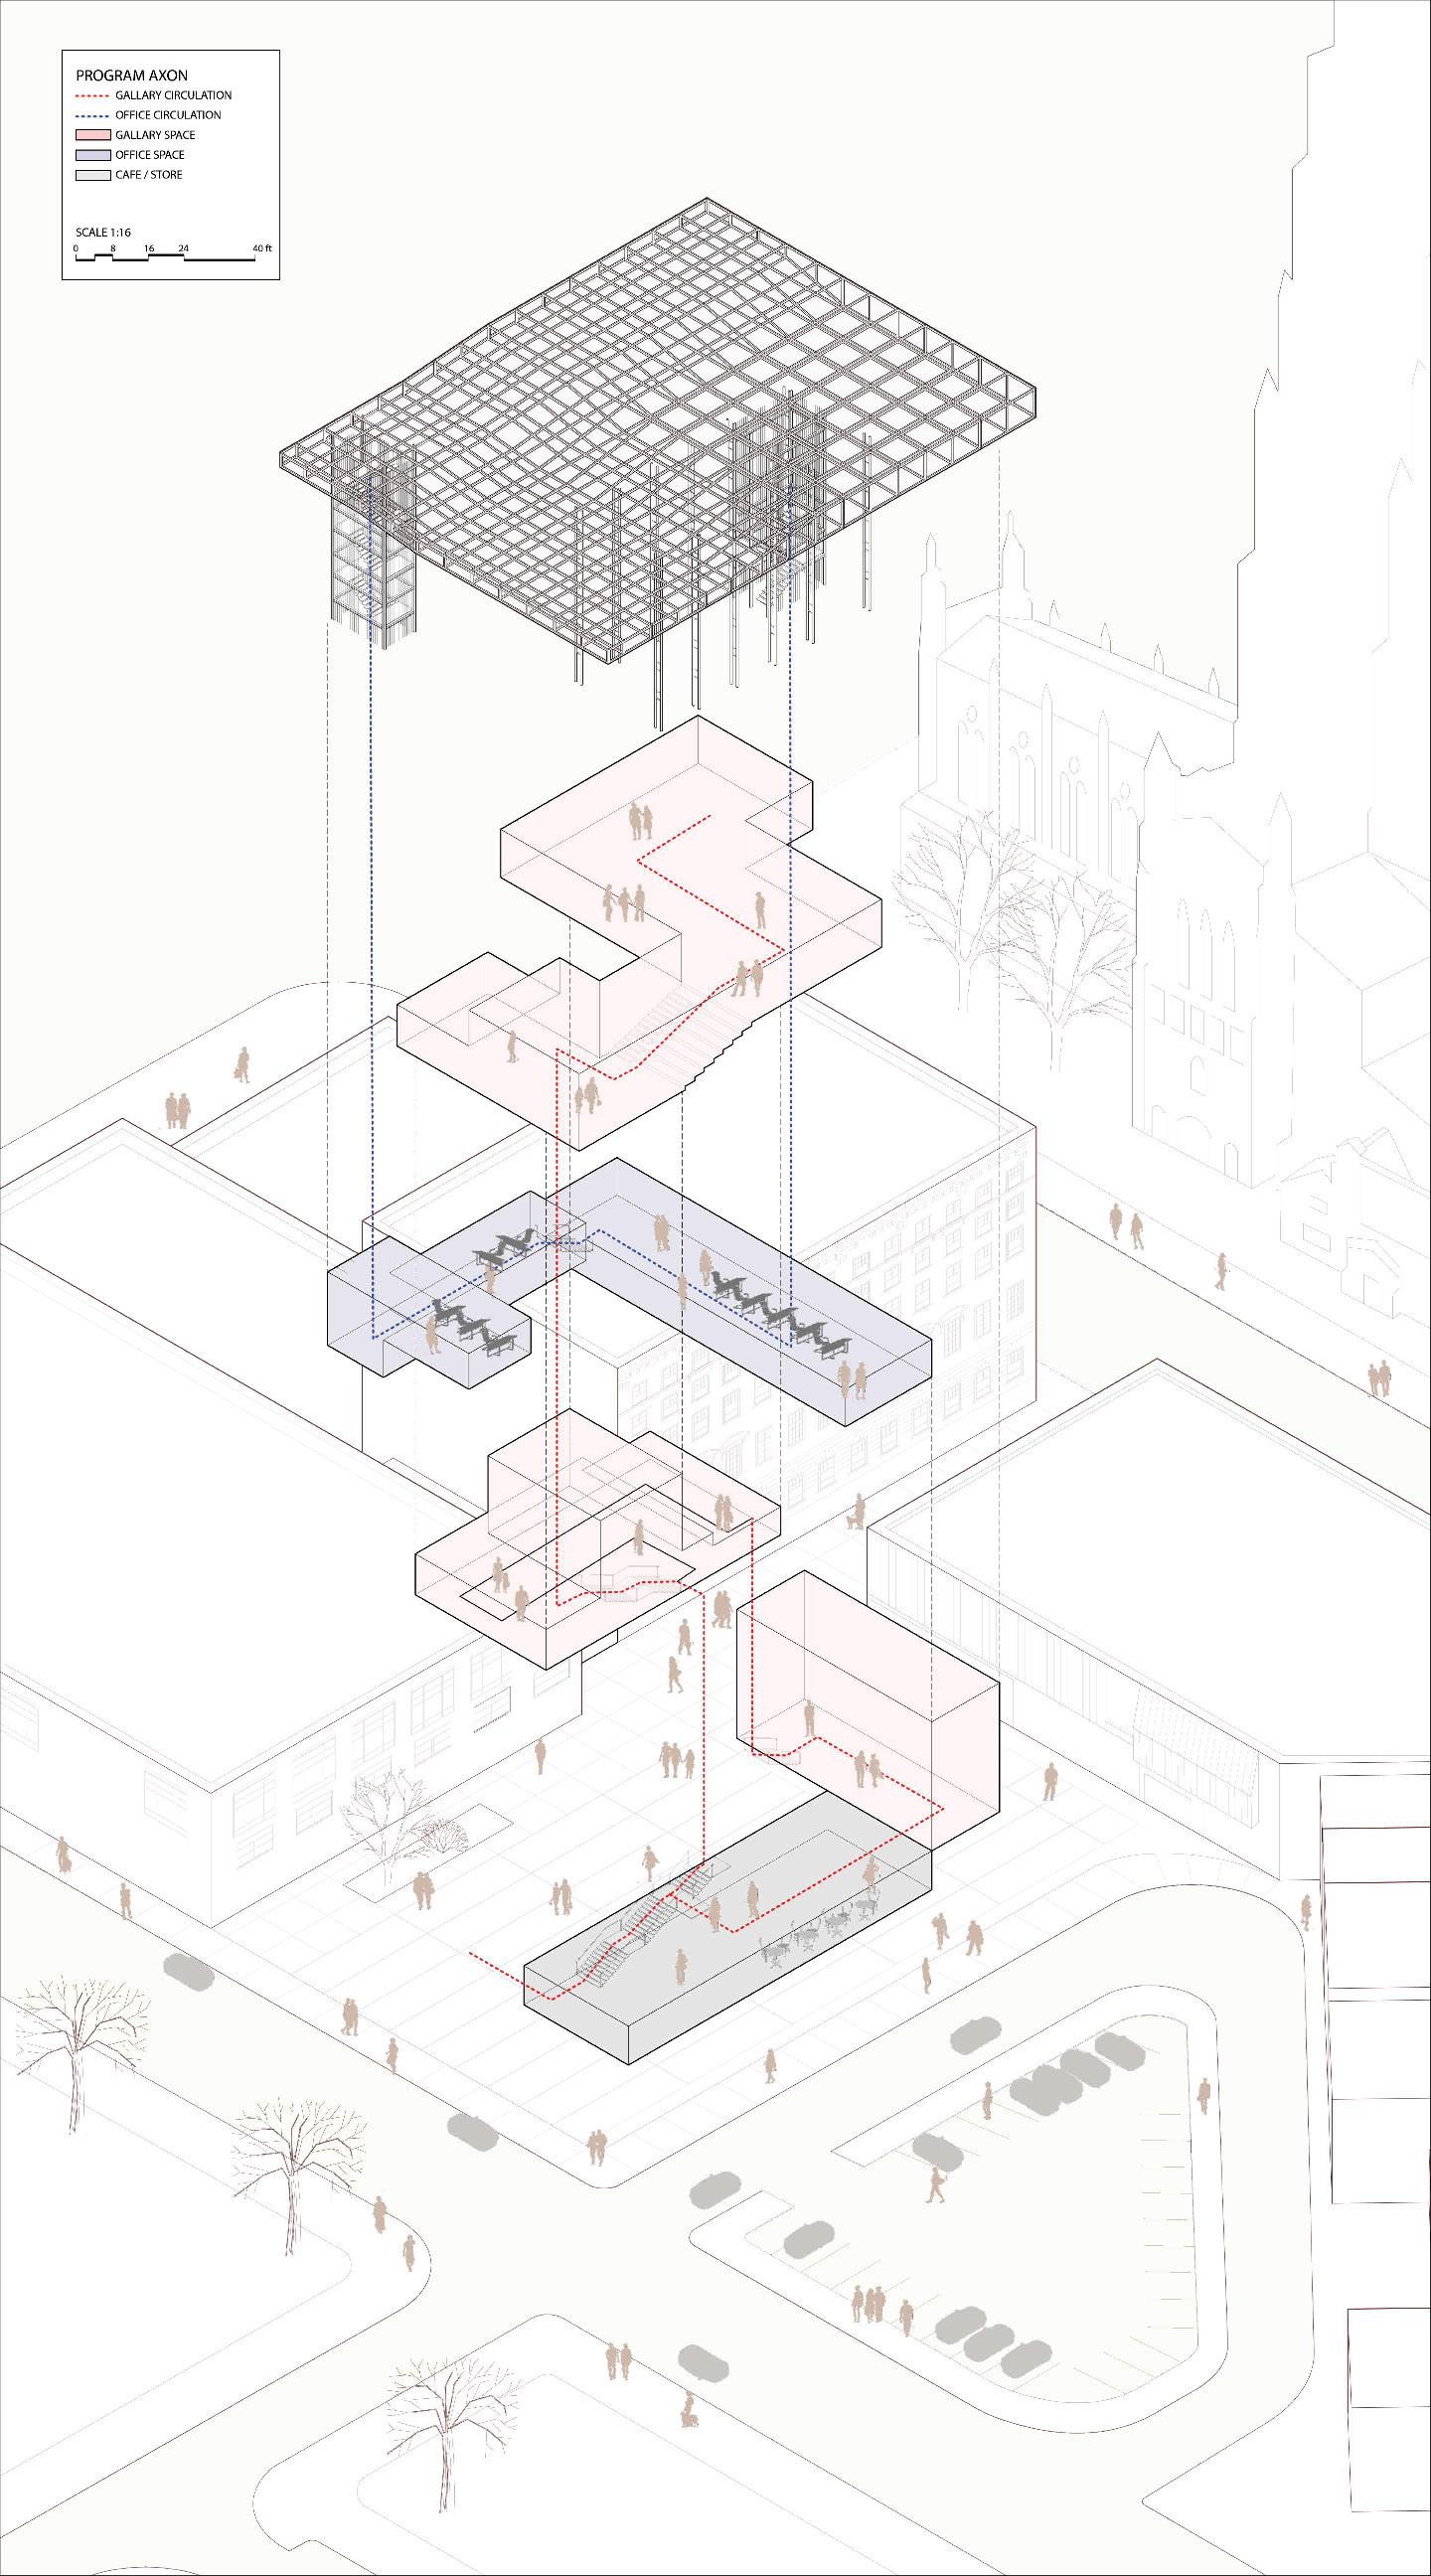 S16 | Jihoon Park (B.Arch 2020)